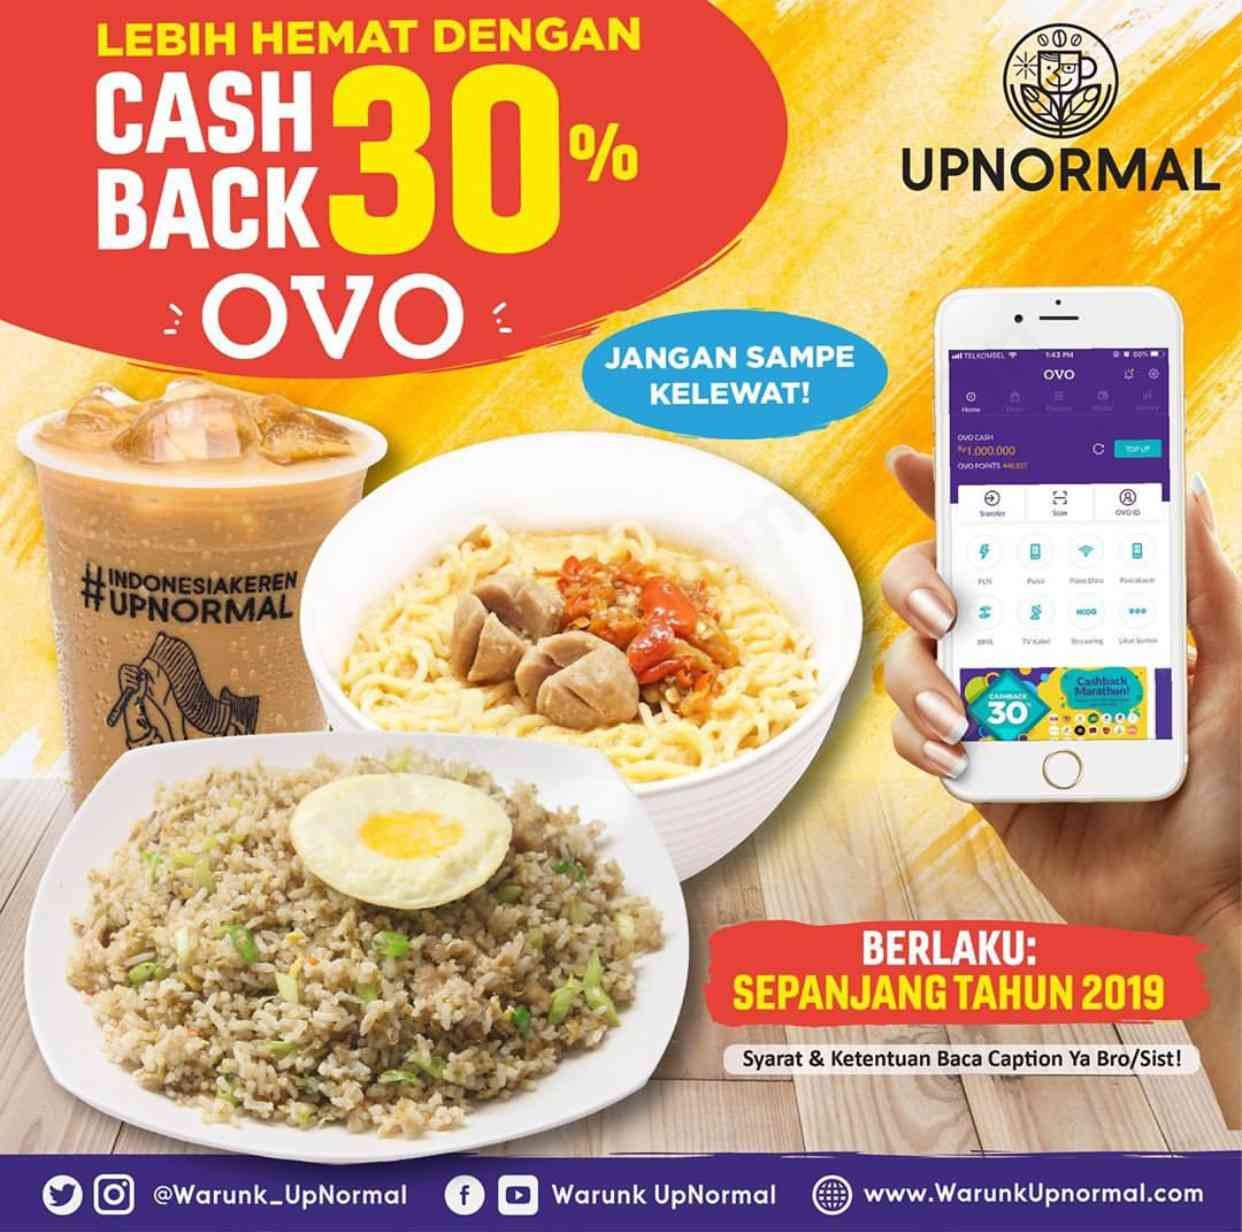 Diskon Warunk Upnormal Cashback 30% dengan OVO